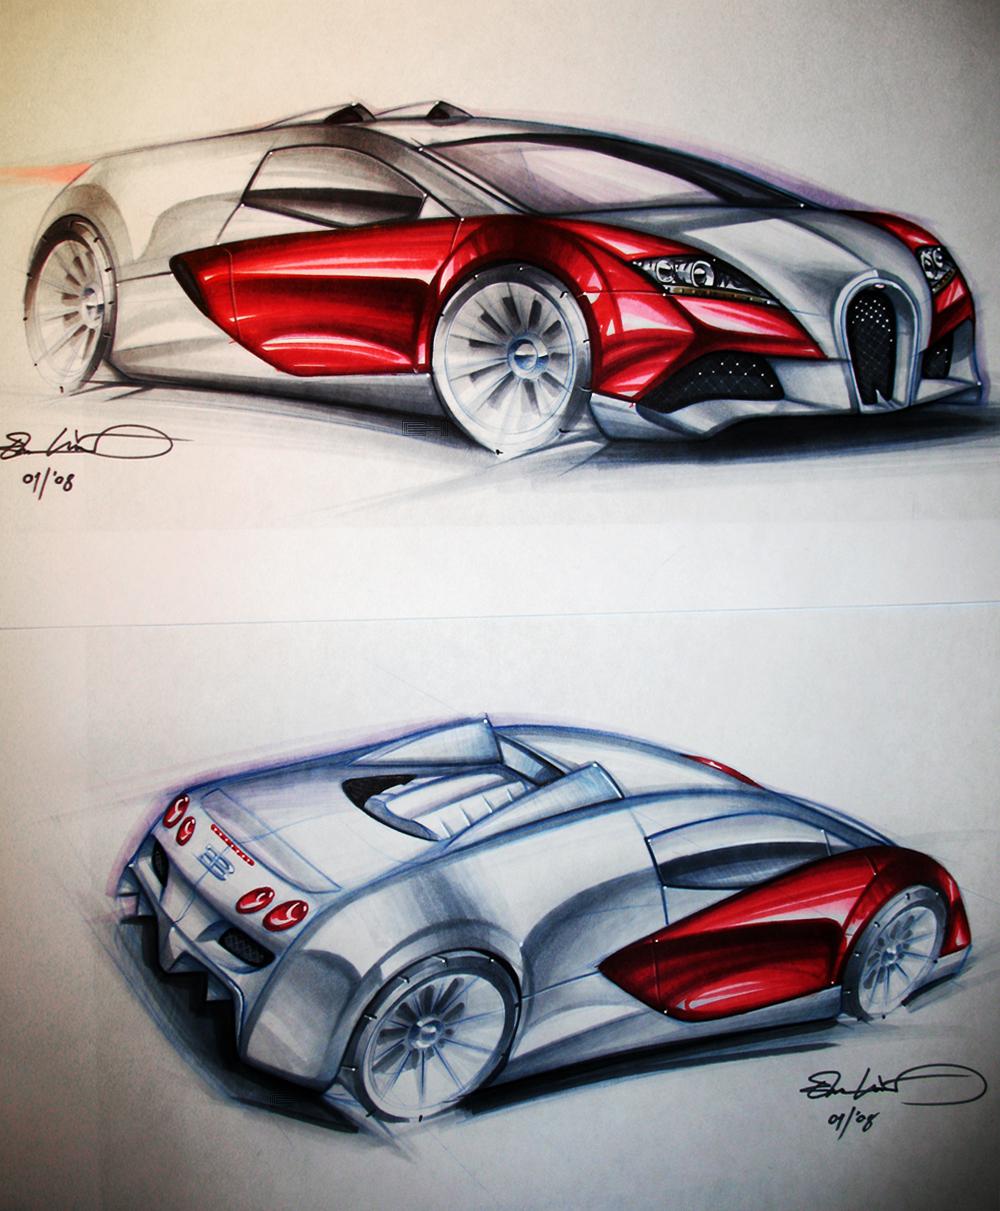 Bugatti Marker Sketches By EmrEHusmen Bugatti Marker Sketches By EmrEHusmen